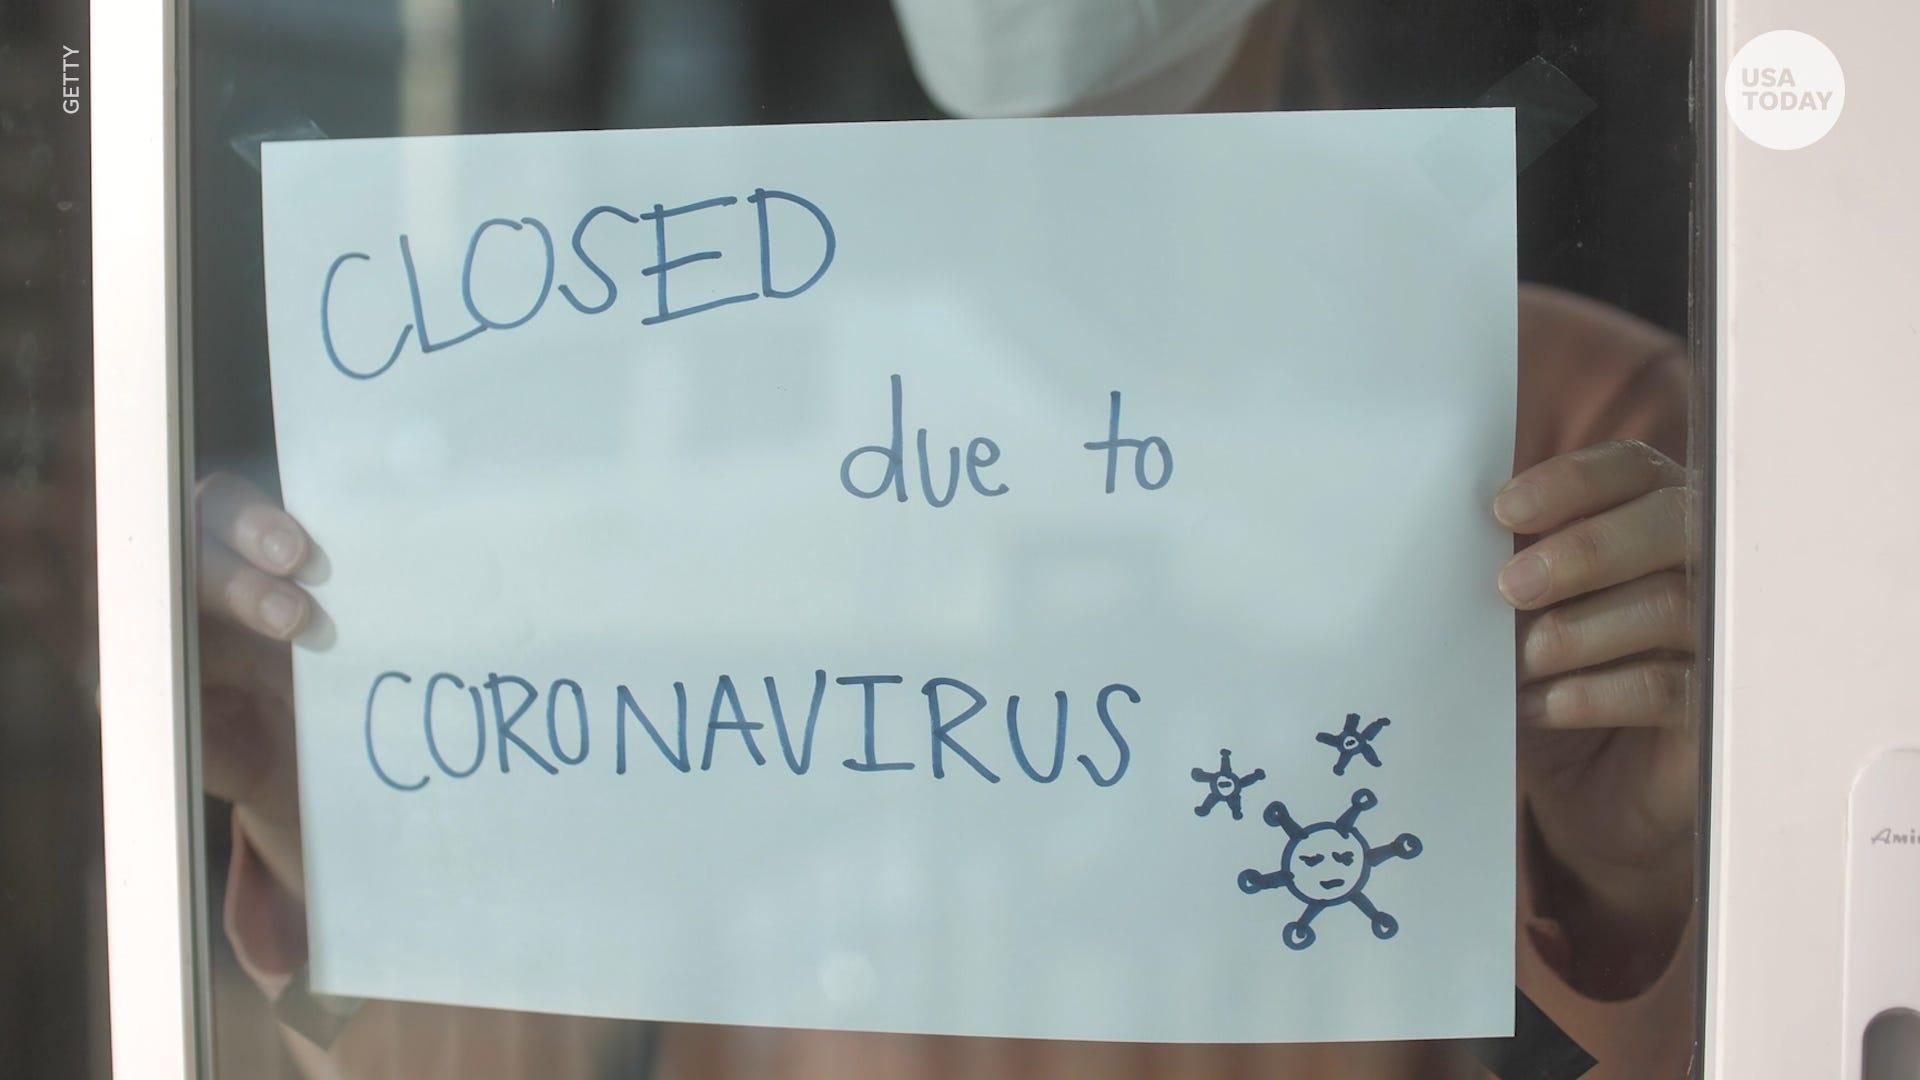 U.S. locations to close March 31 amid COVID